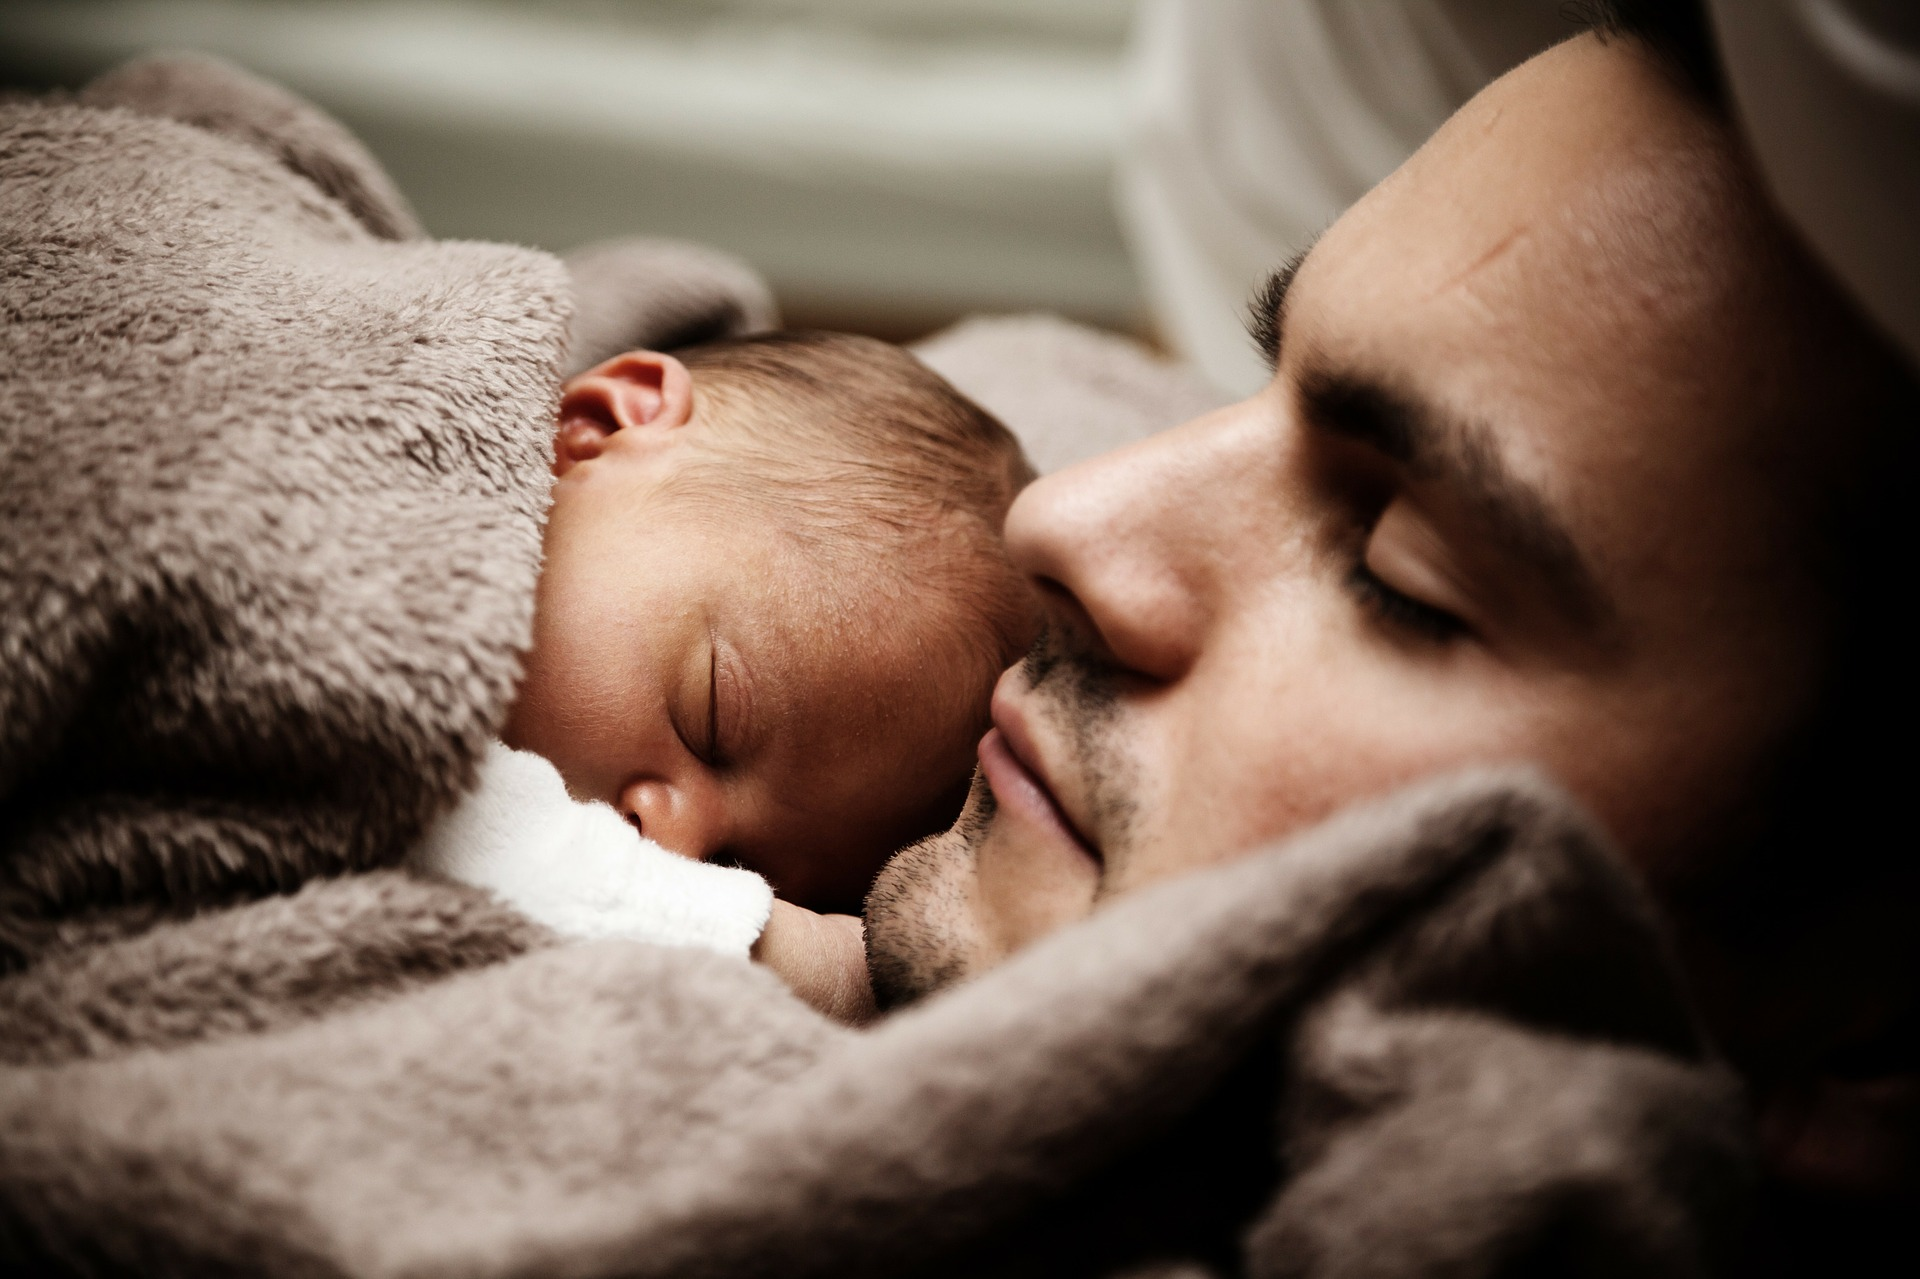 Trailer Hitch RV Sleeping Baby